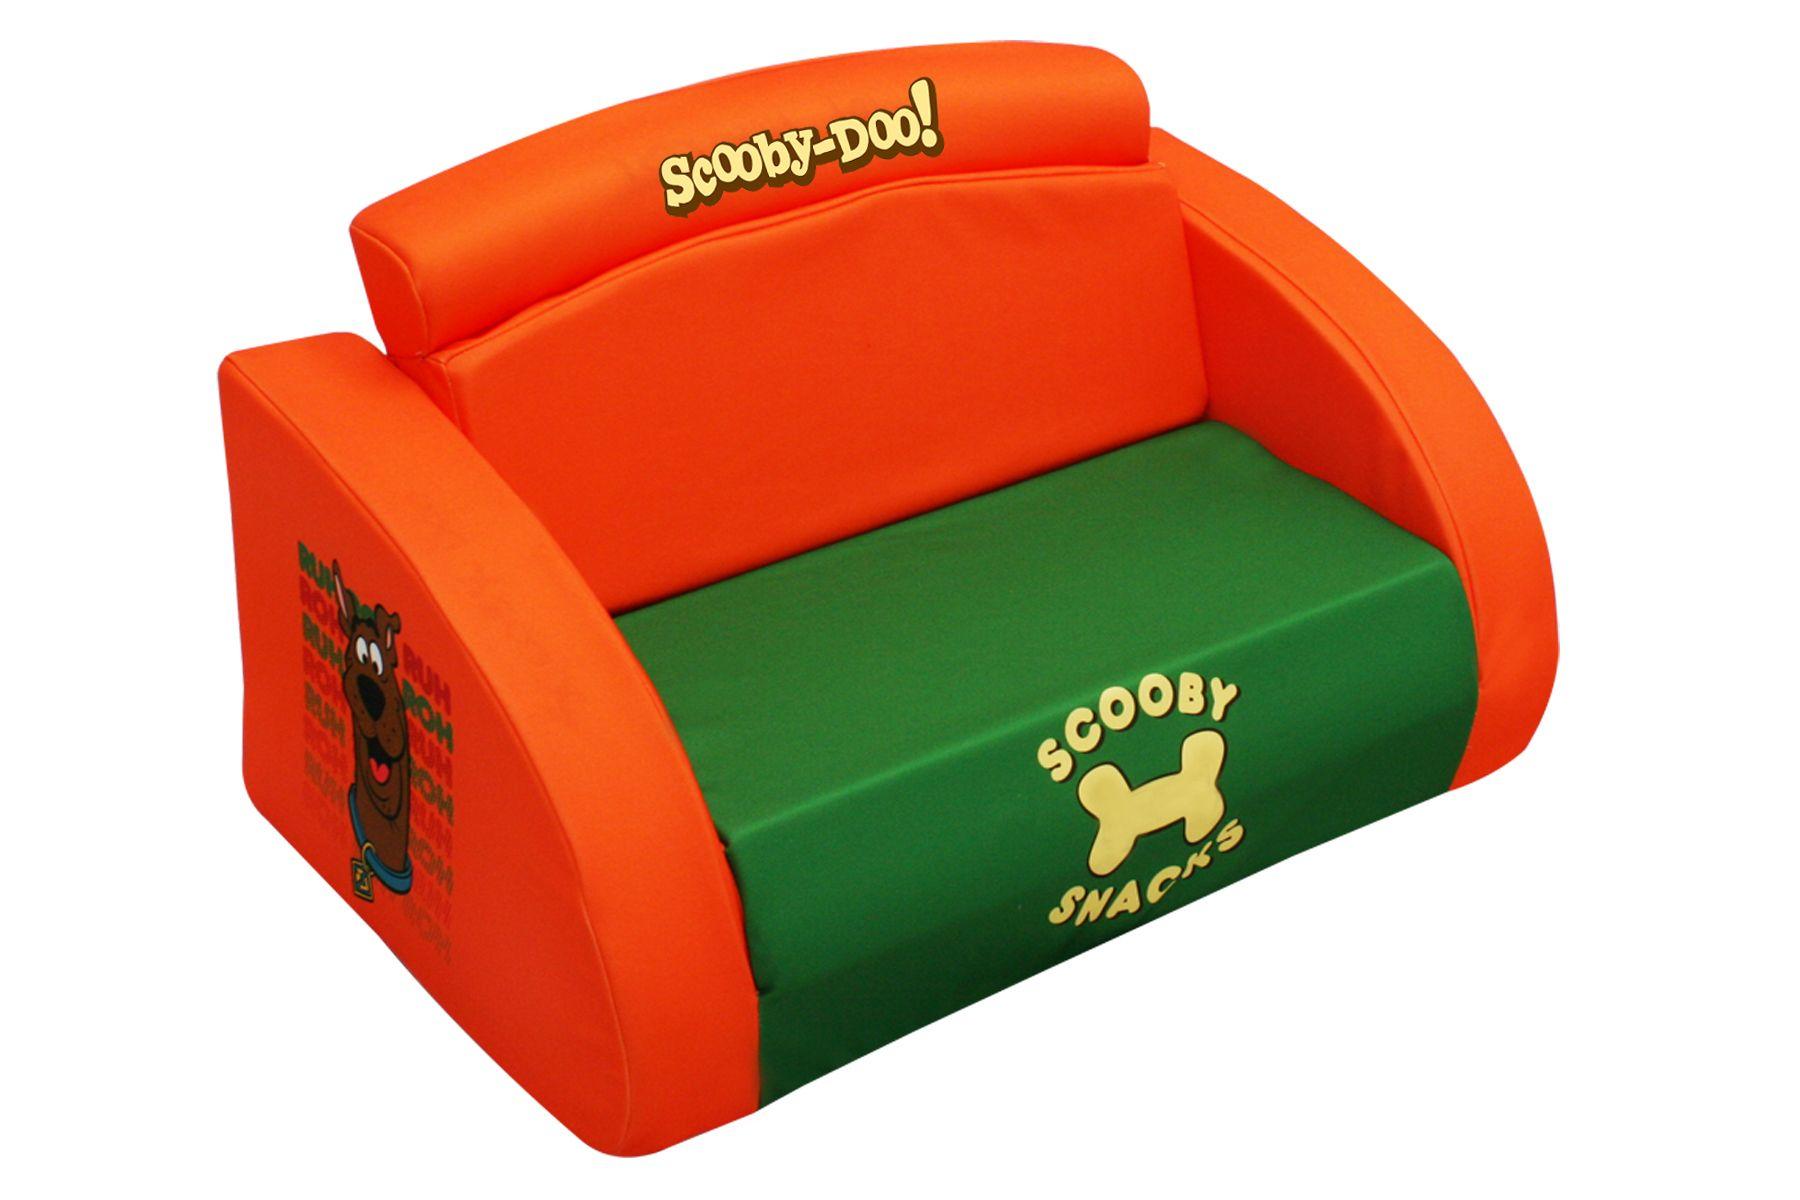 scooby doo chair hair salon superior warner brothers roh flip sofa